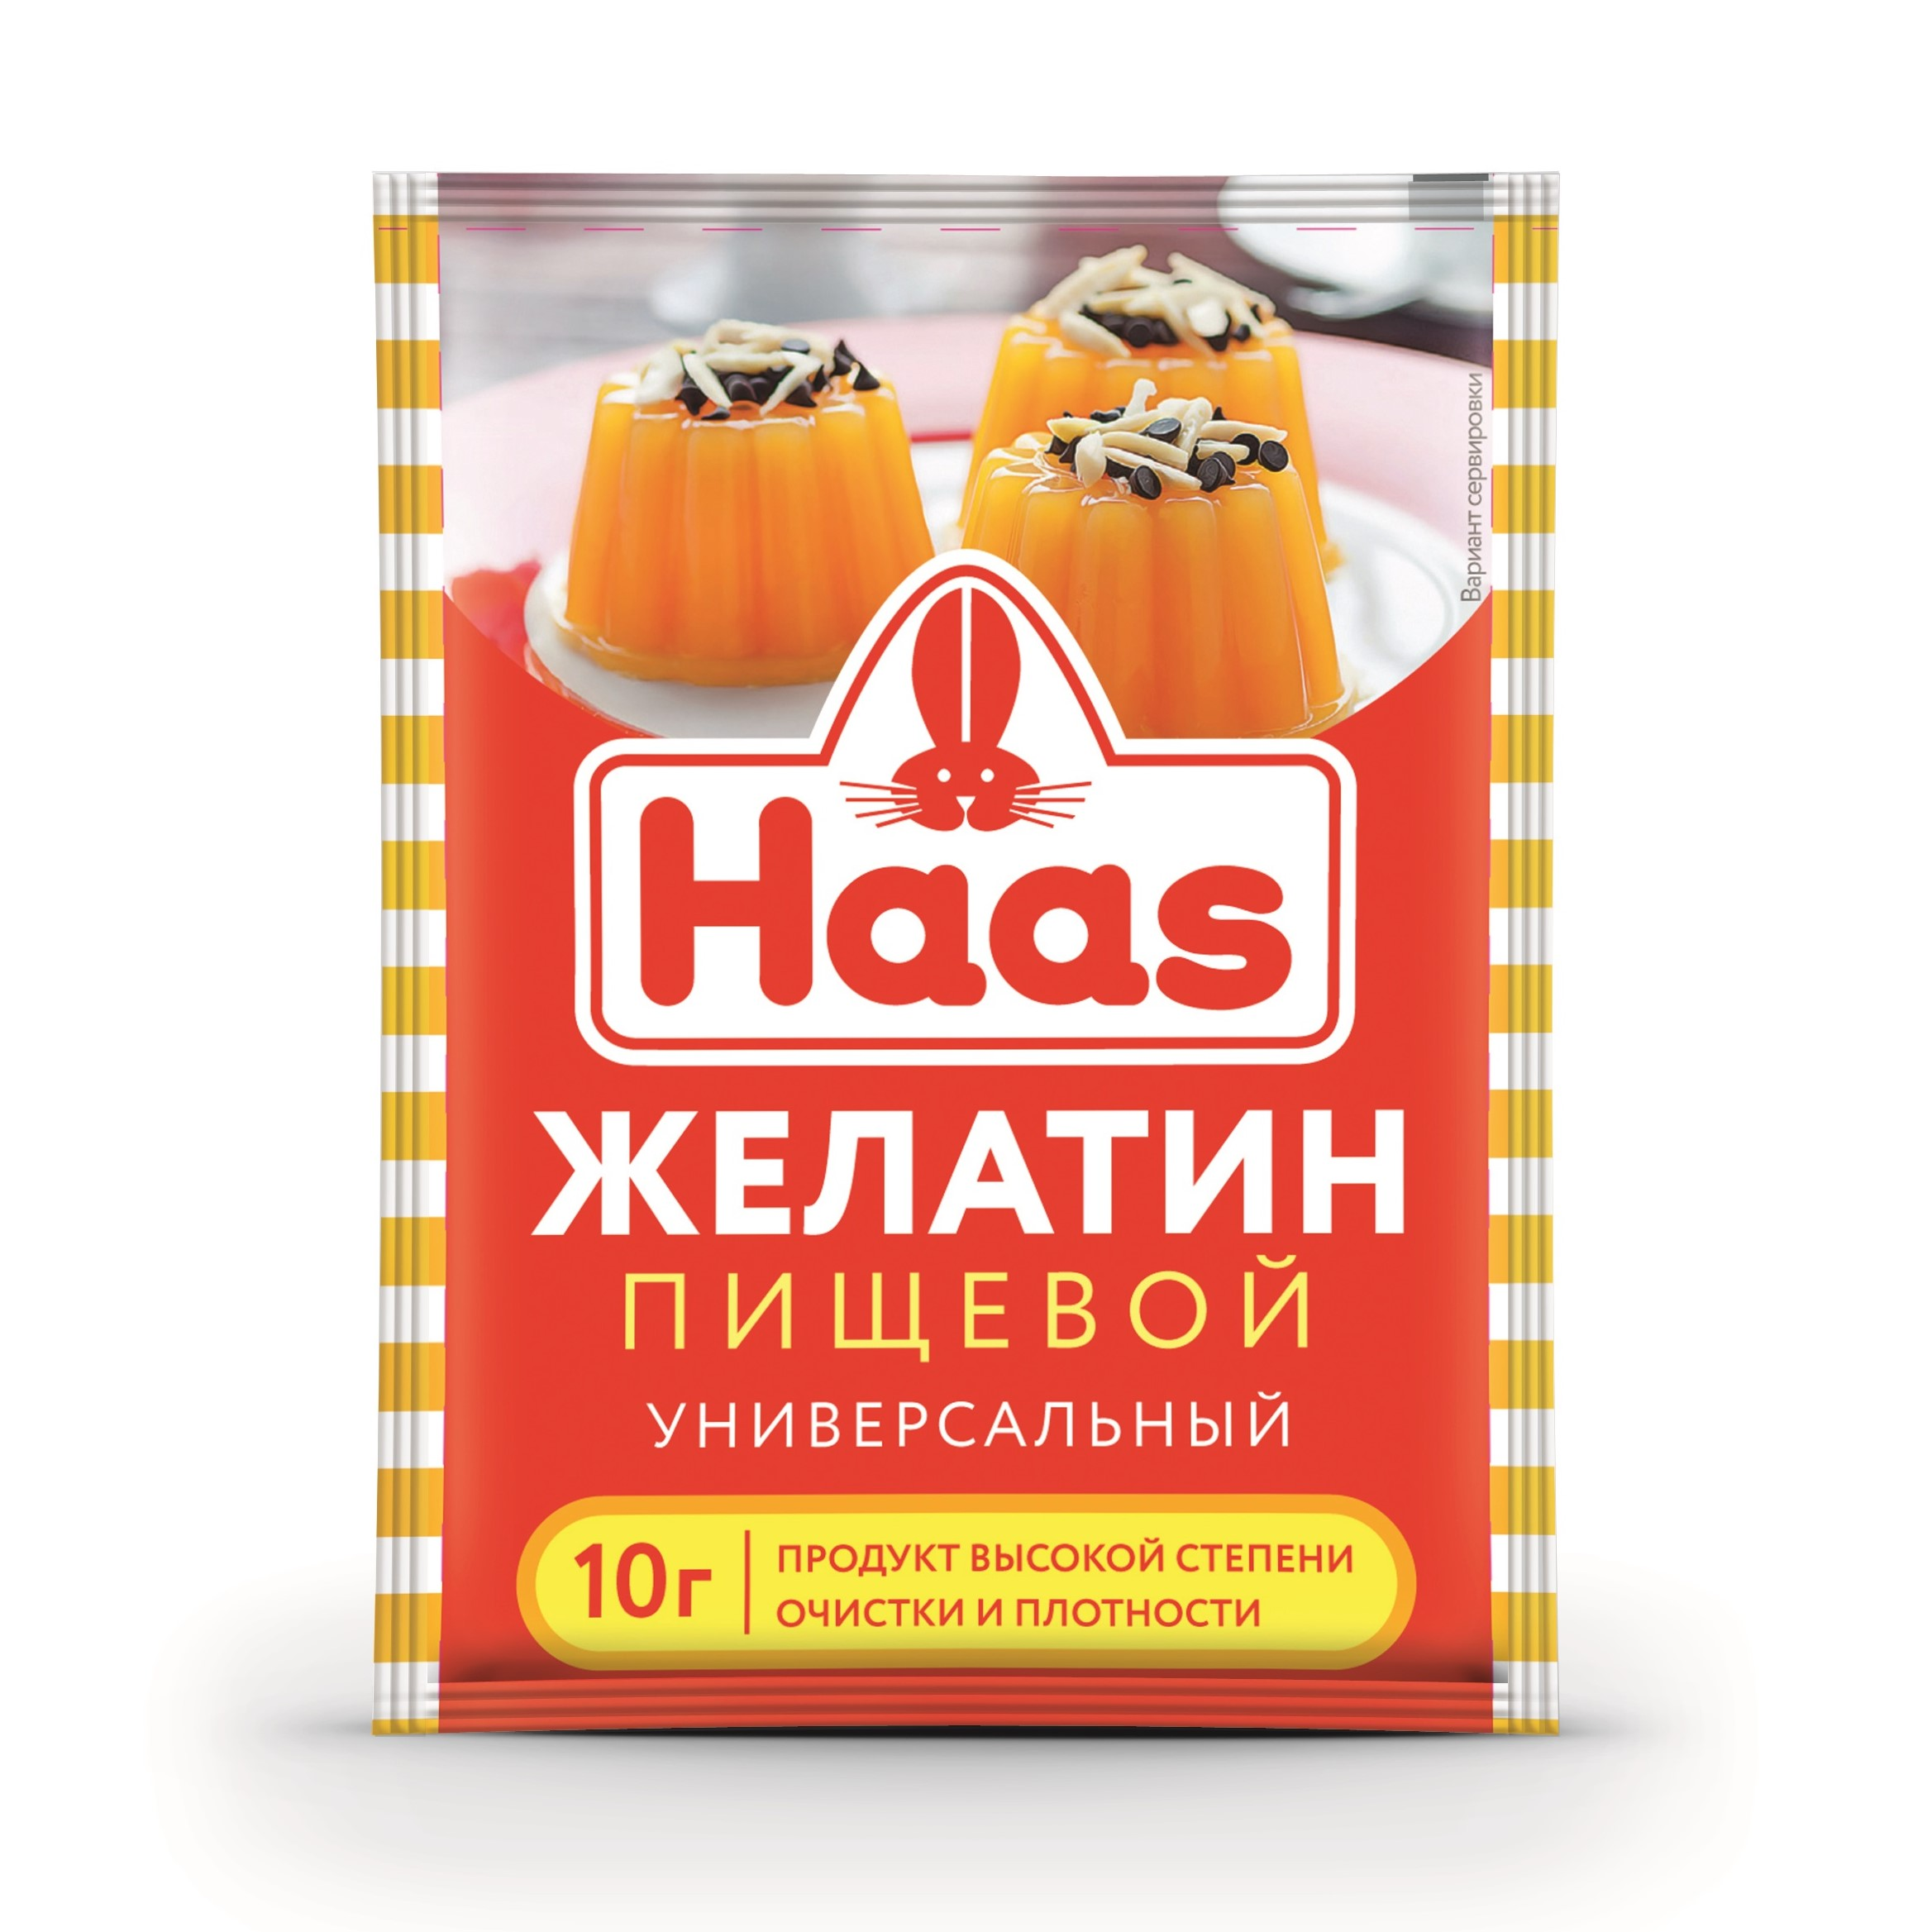 Фото - Желатин пищевой Haas 10 г желатин пищевой haas 10 г